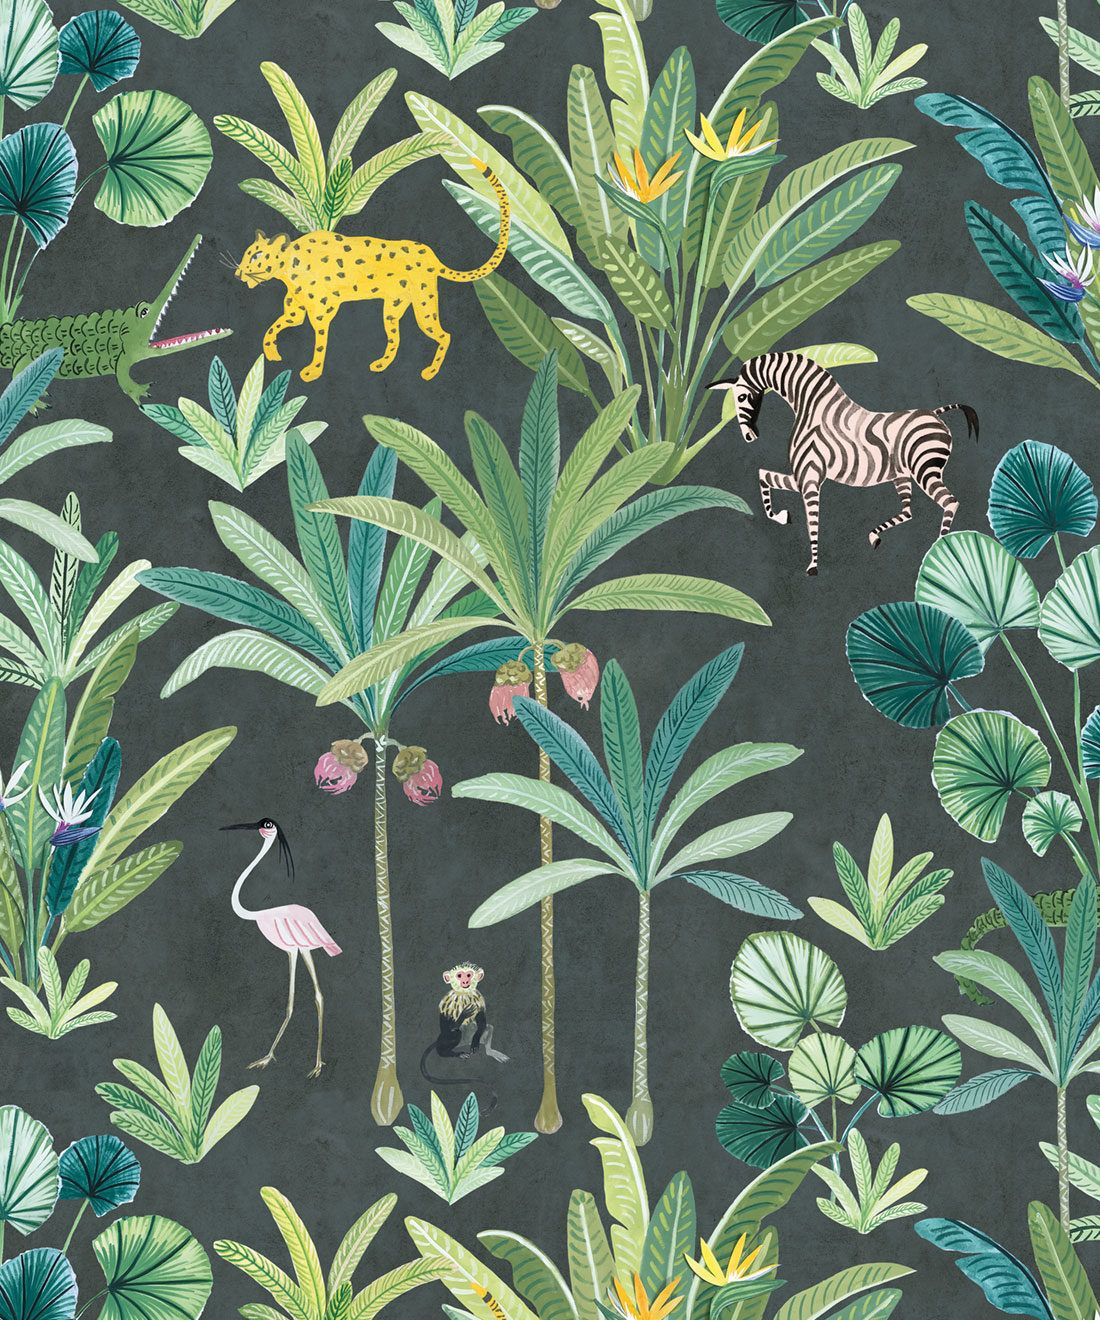 Jungle Wallpaper Gorgeous Animal Kingdom Jungle Wallpaper Animal Kingdom Palm Wallpaper